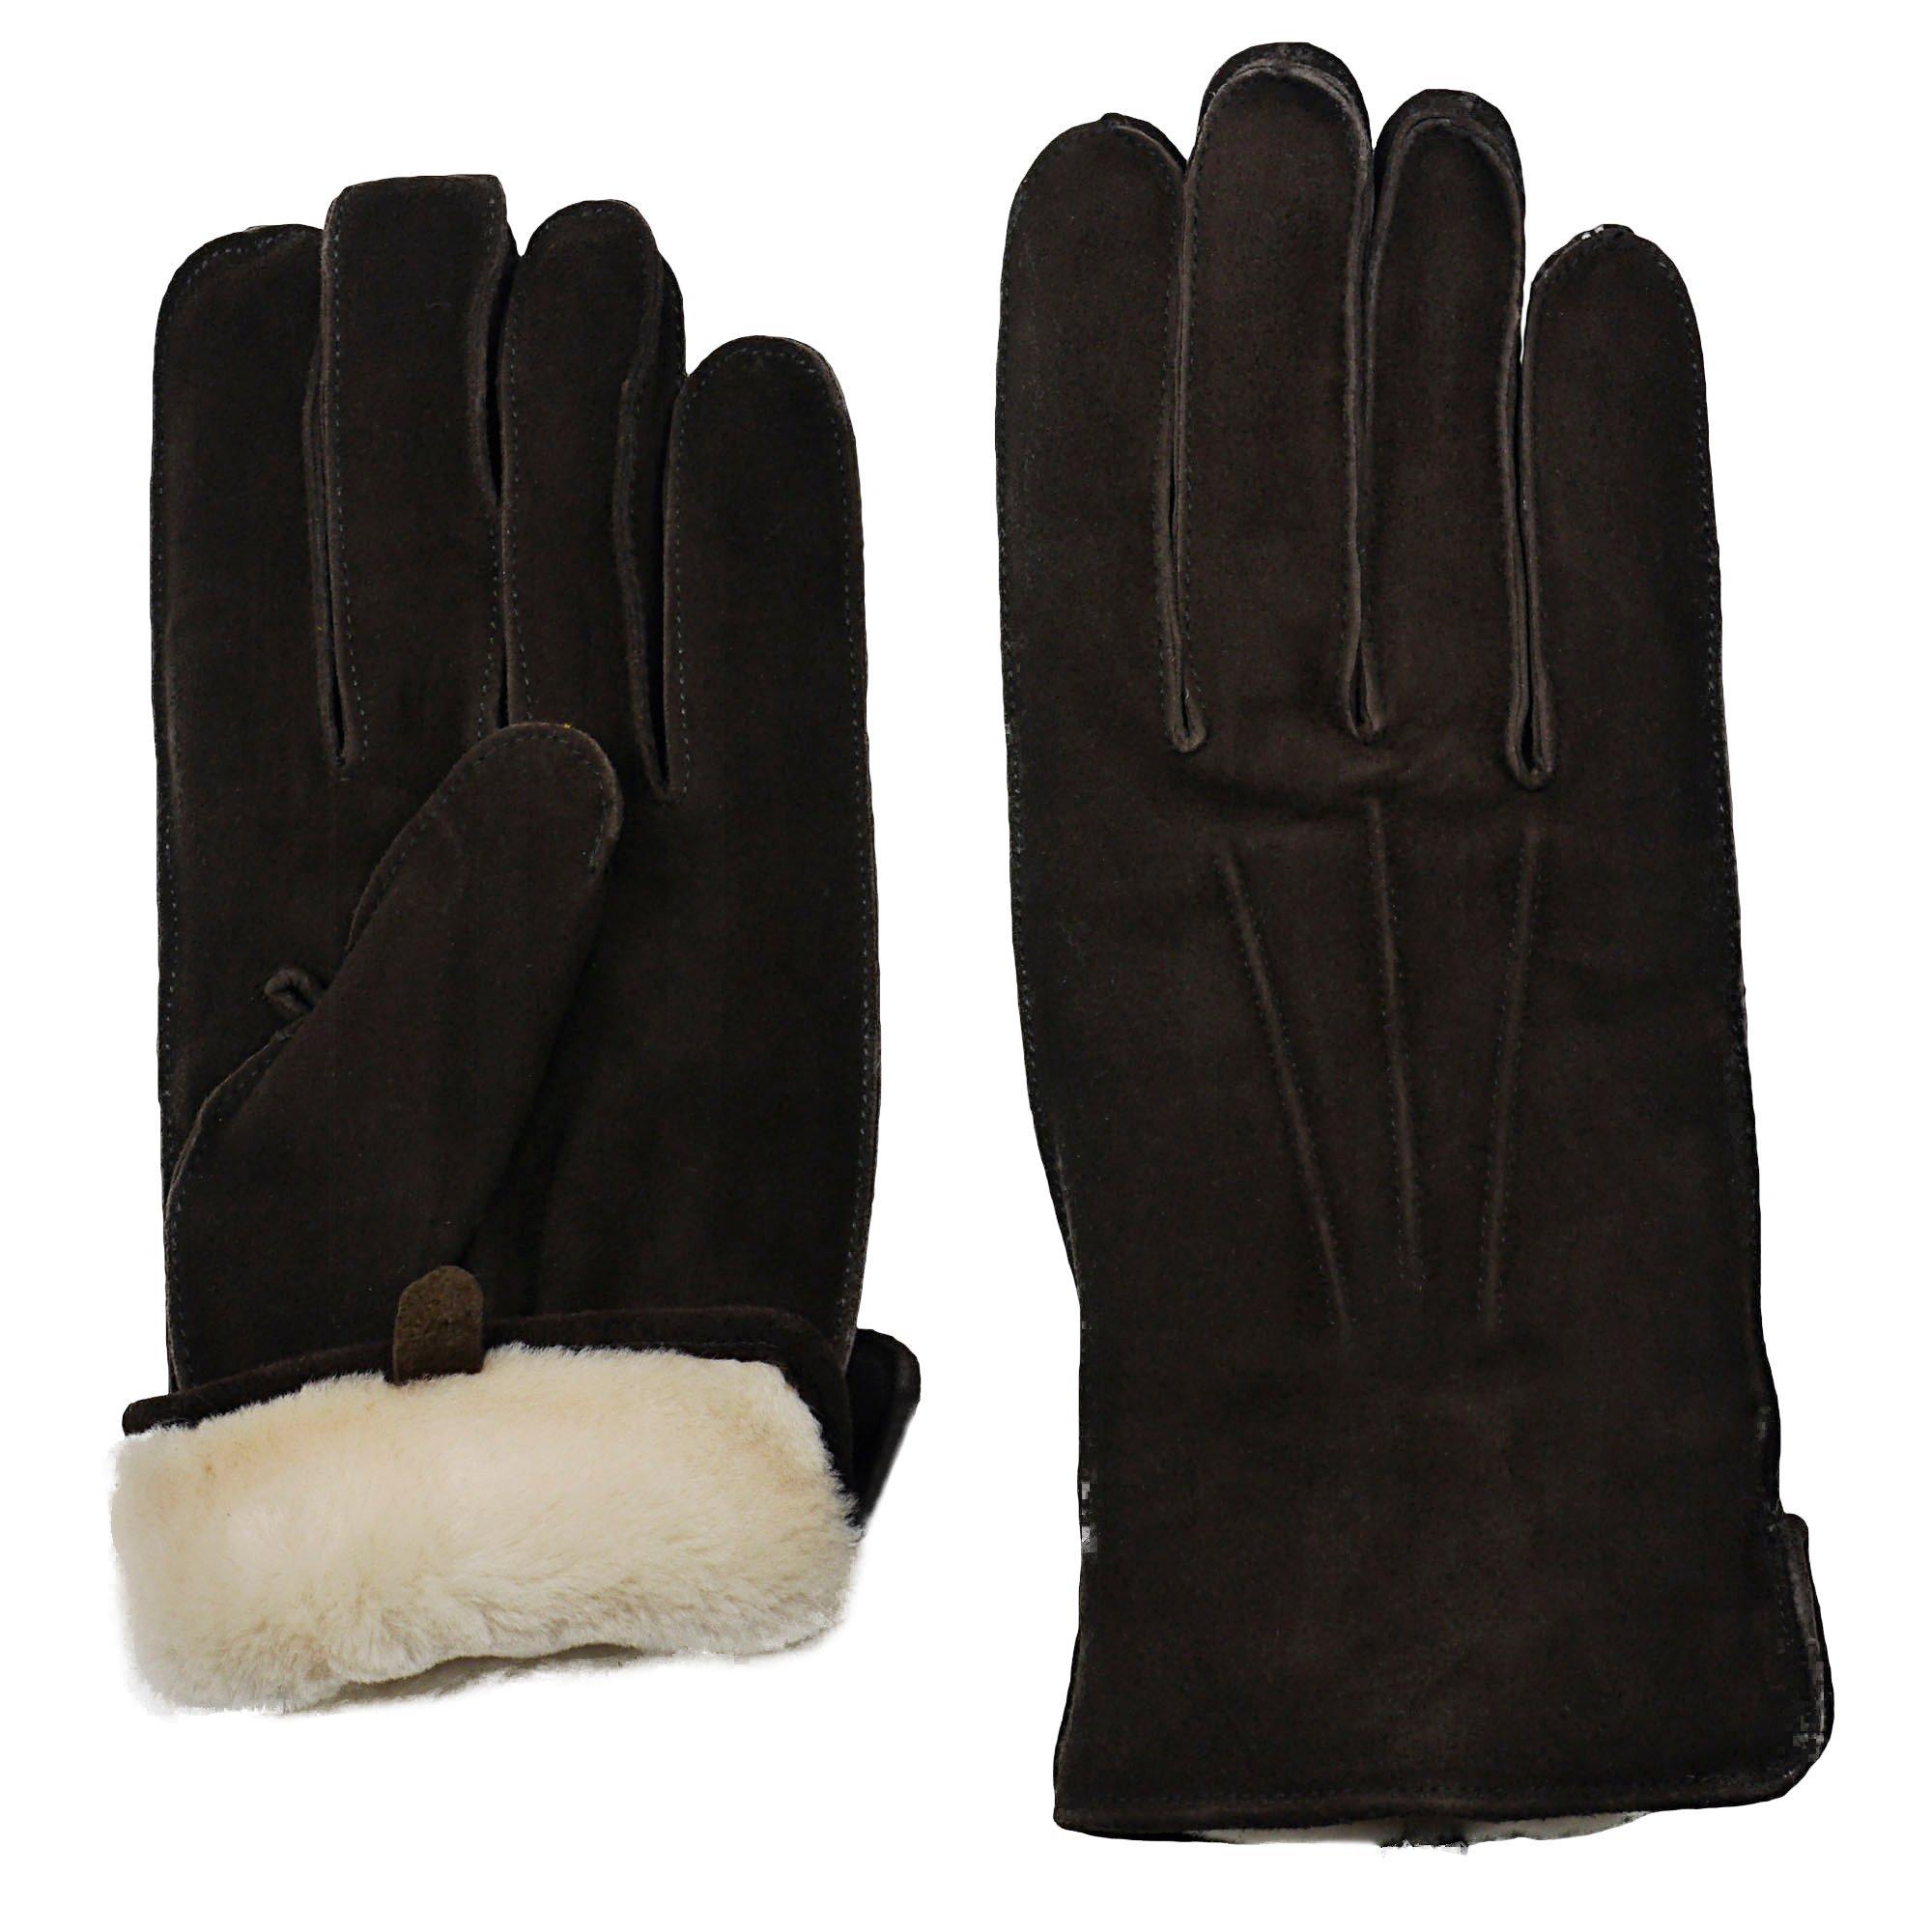 GRANDOE Men's OAKBROOK Genuine SUEDE Leather Glove with Real SHEARLING FUR Cuff (Brown, Medium)